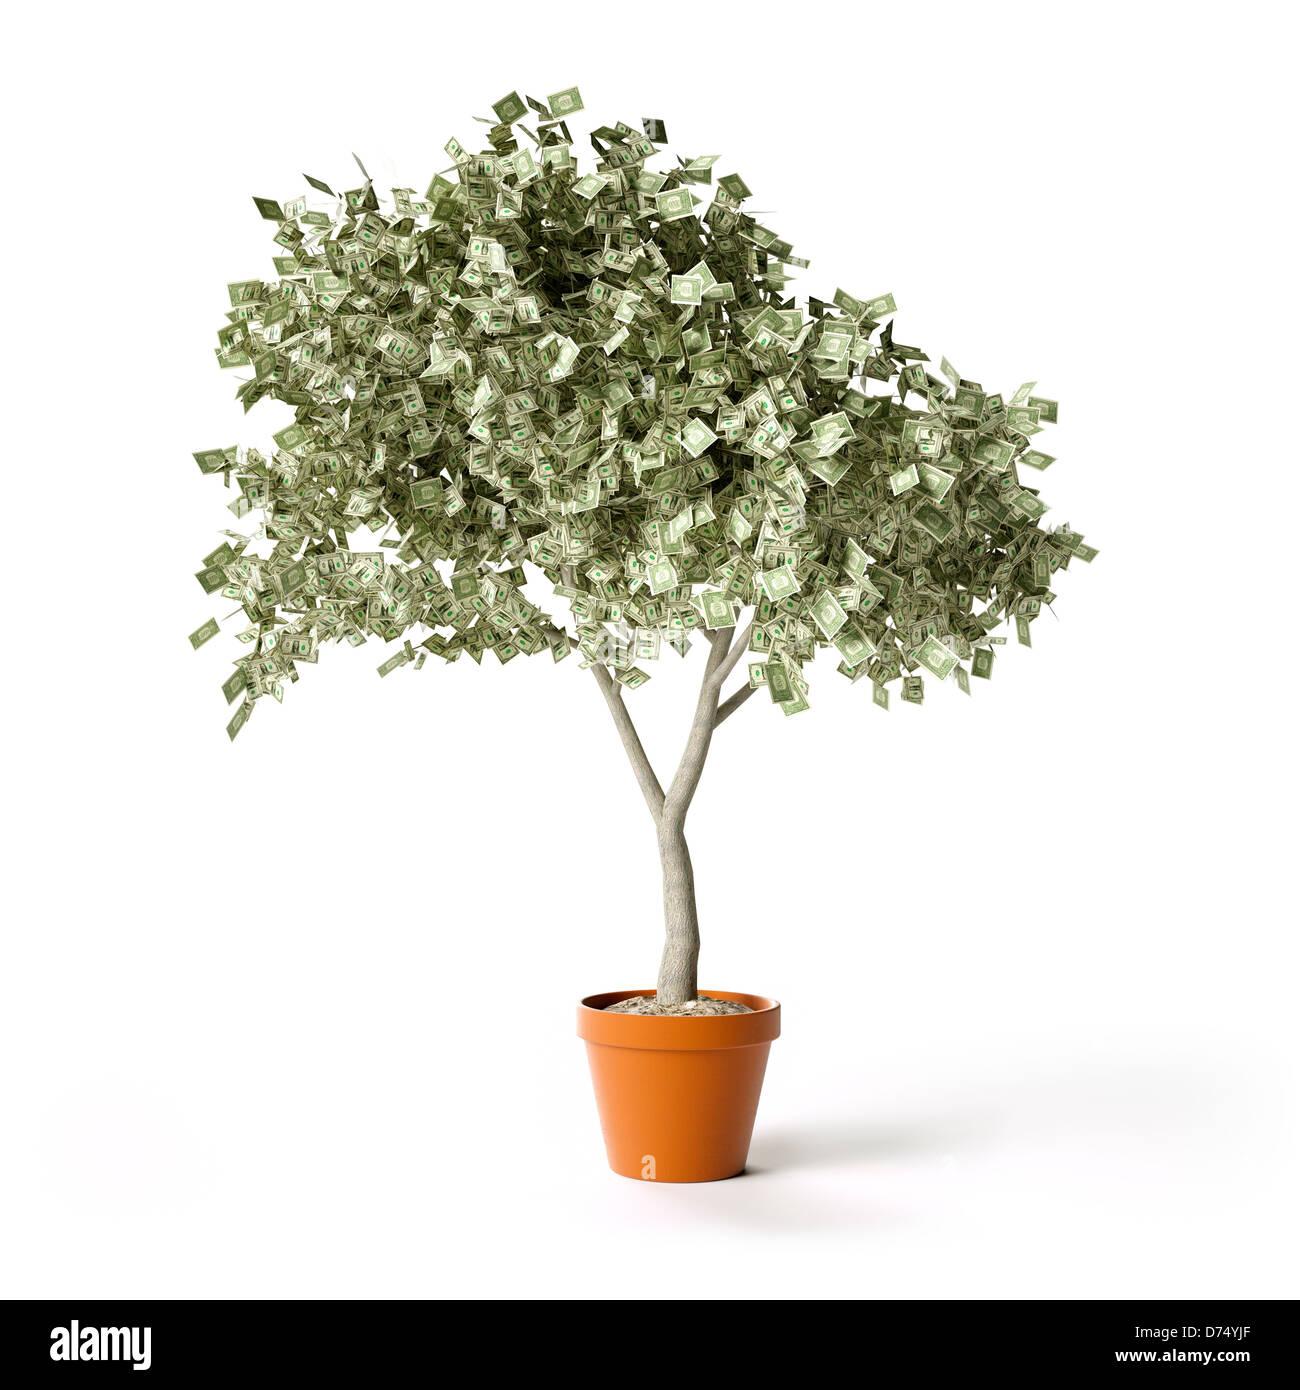 Dollar bills money tree - Stock Image